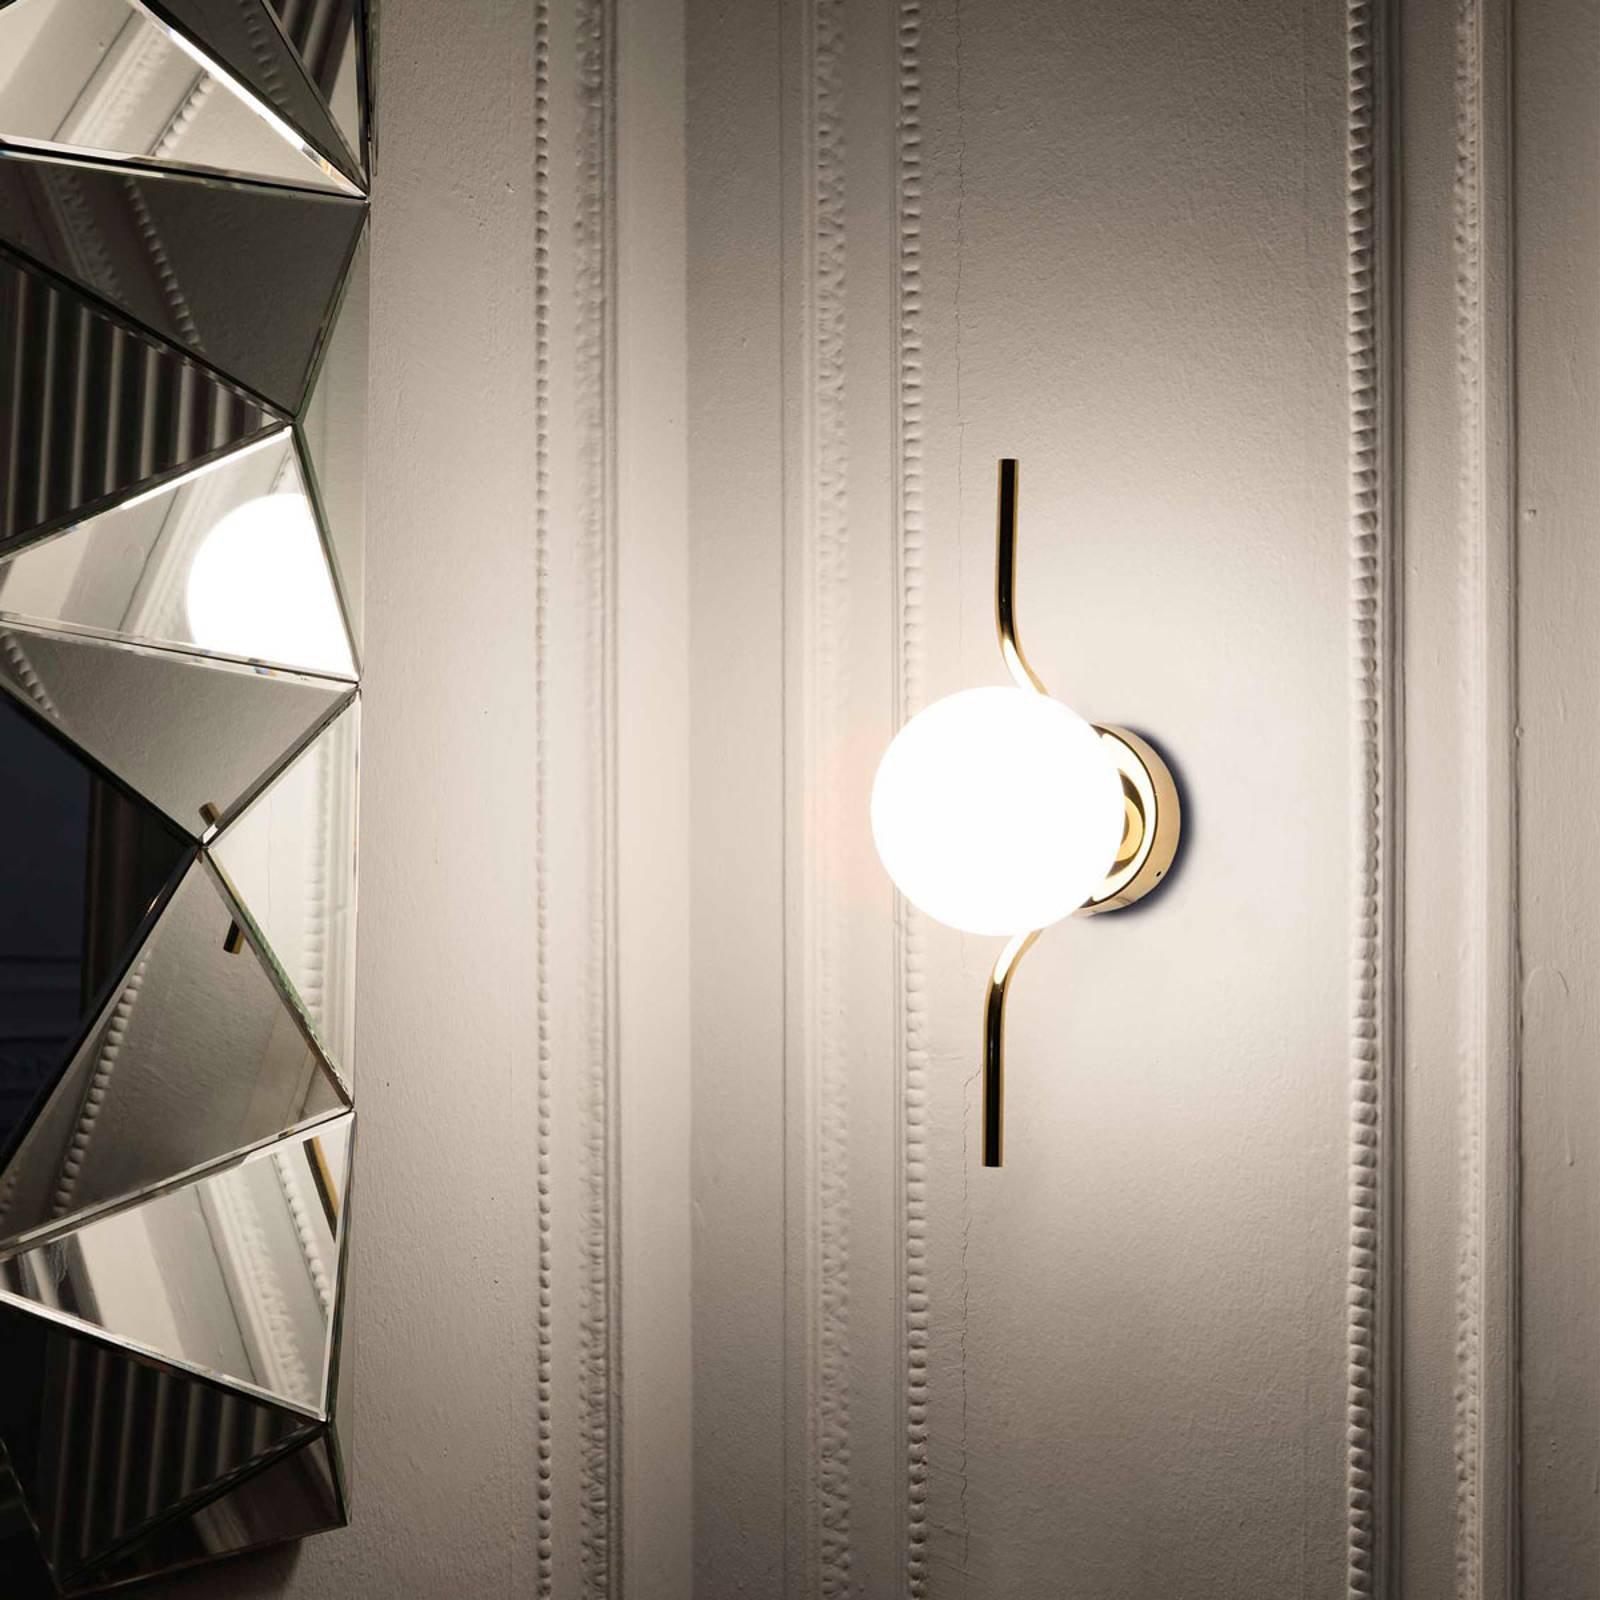 LED-vegglampe Le Vita med opalglass